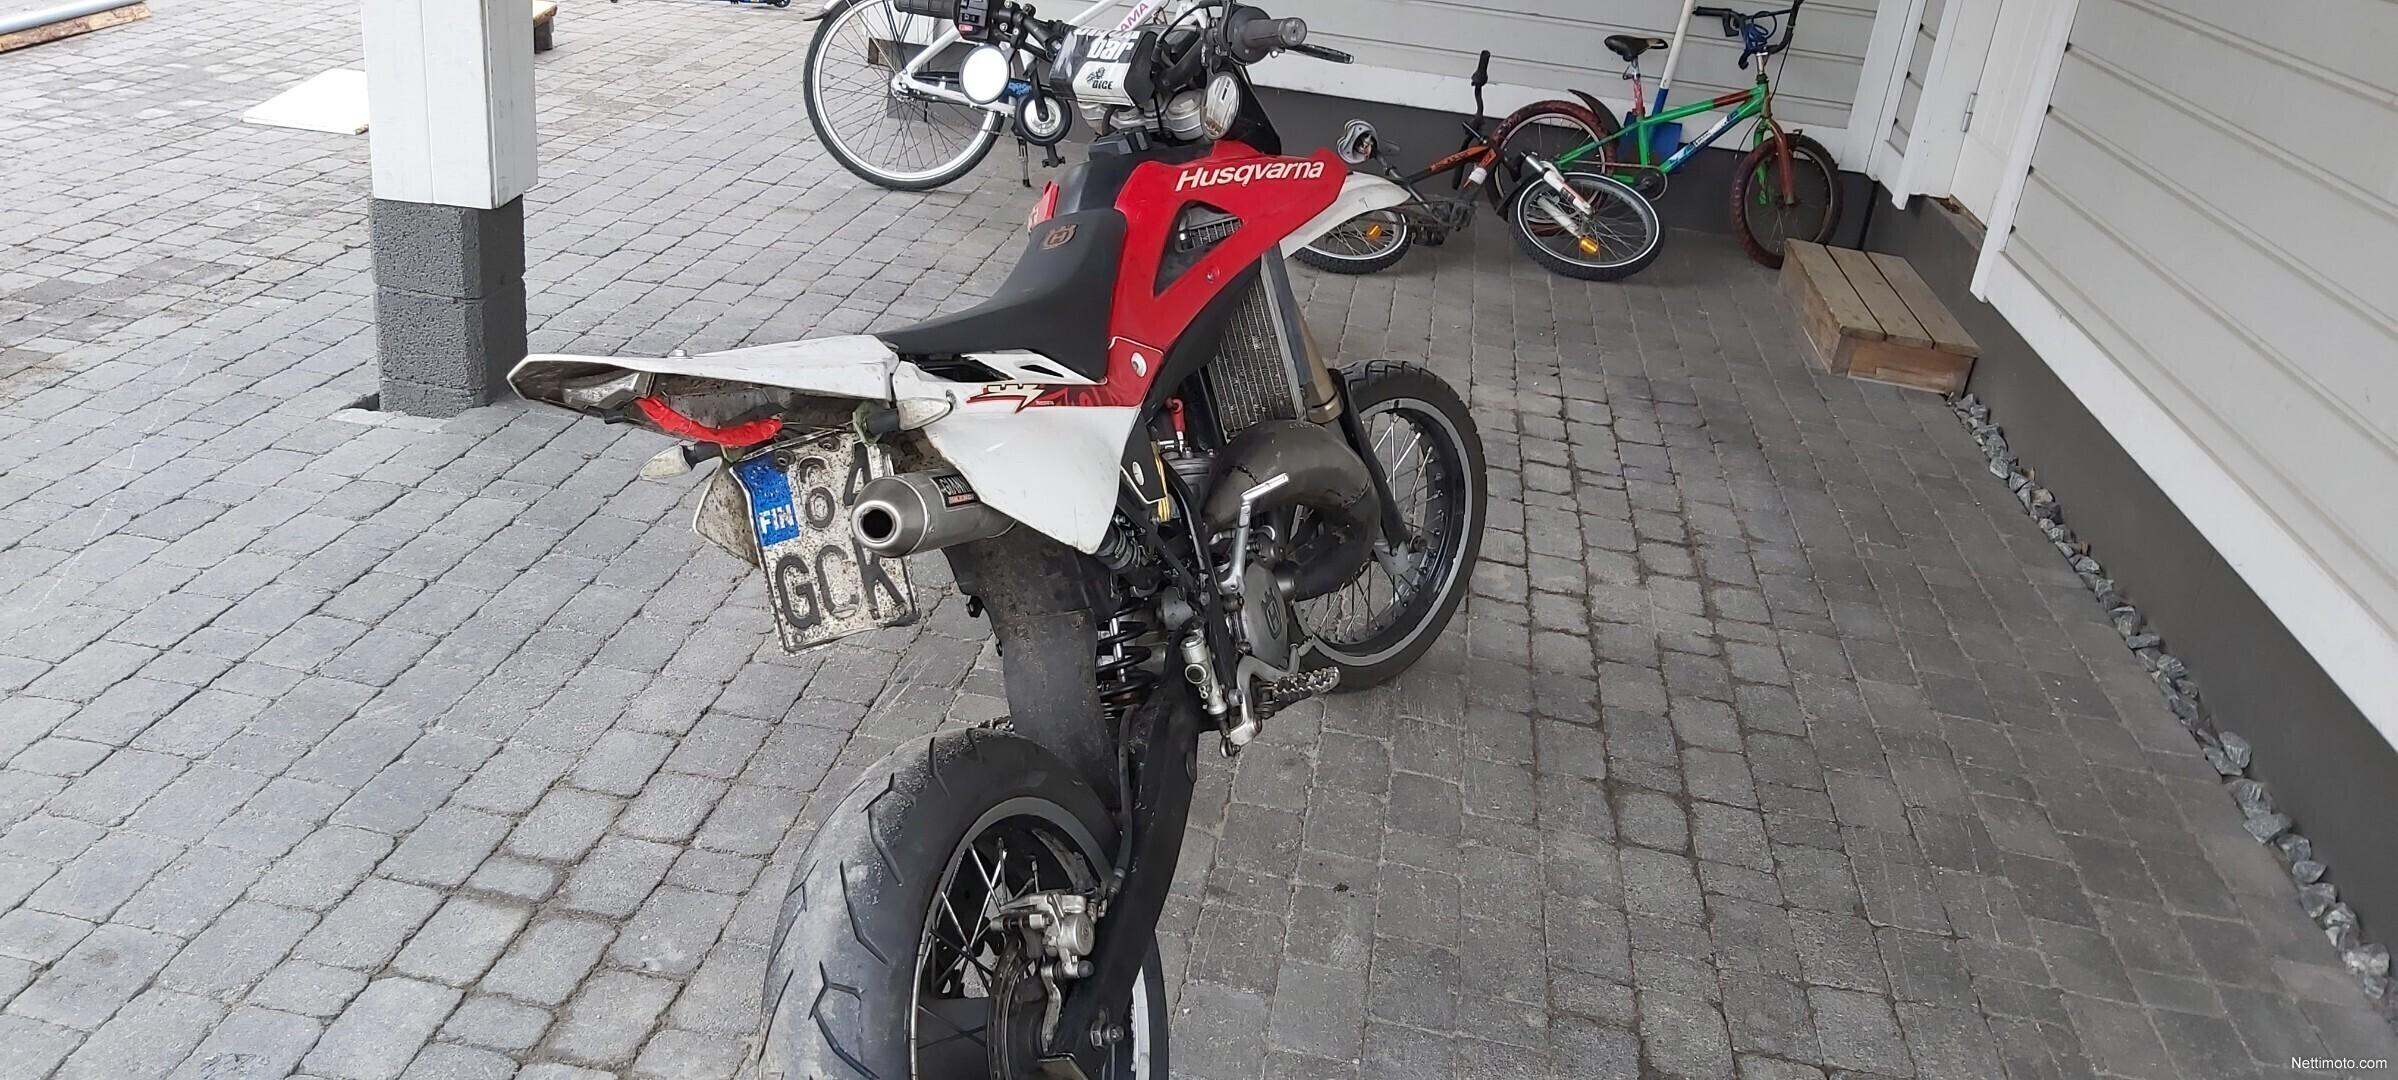 Husqvarna Sm 125 Cm U00b3 2008 - Kontiolahti - Moottoripy U00f6r U00e4